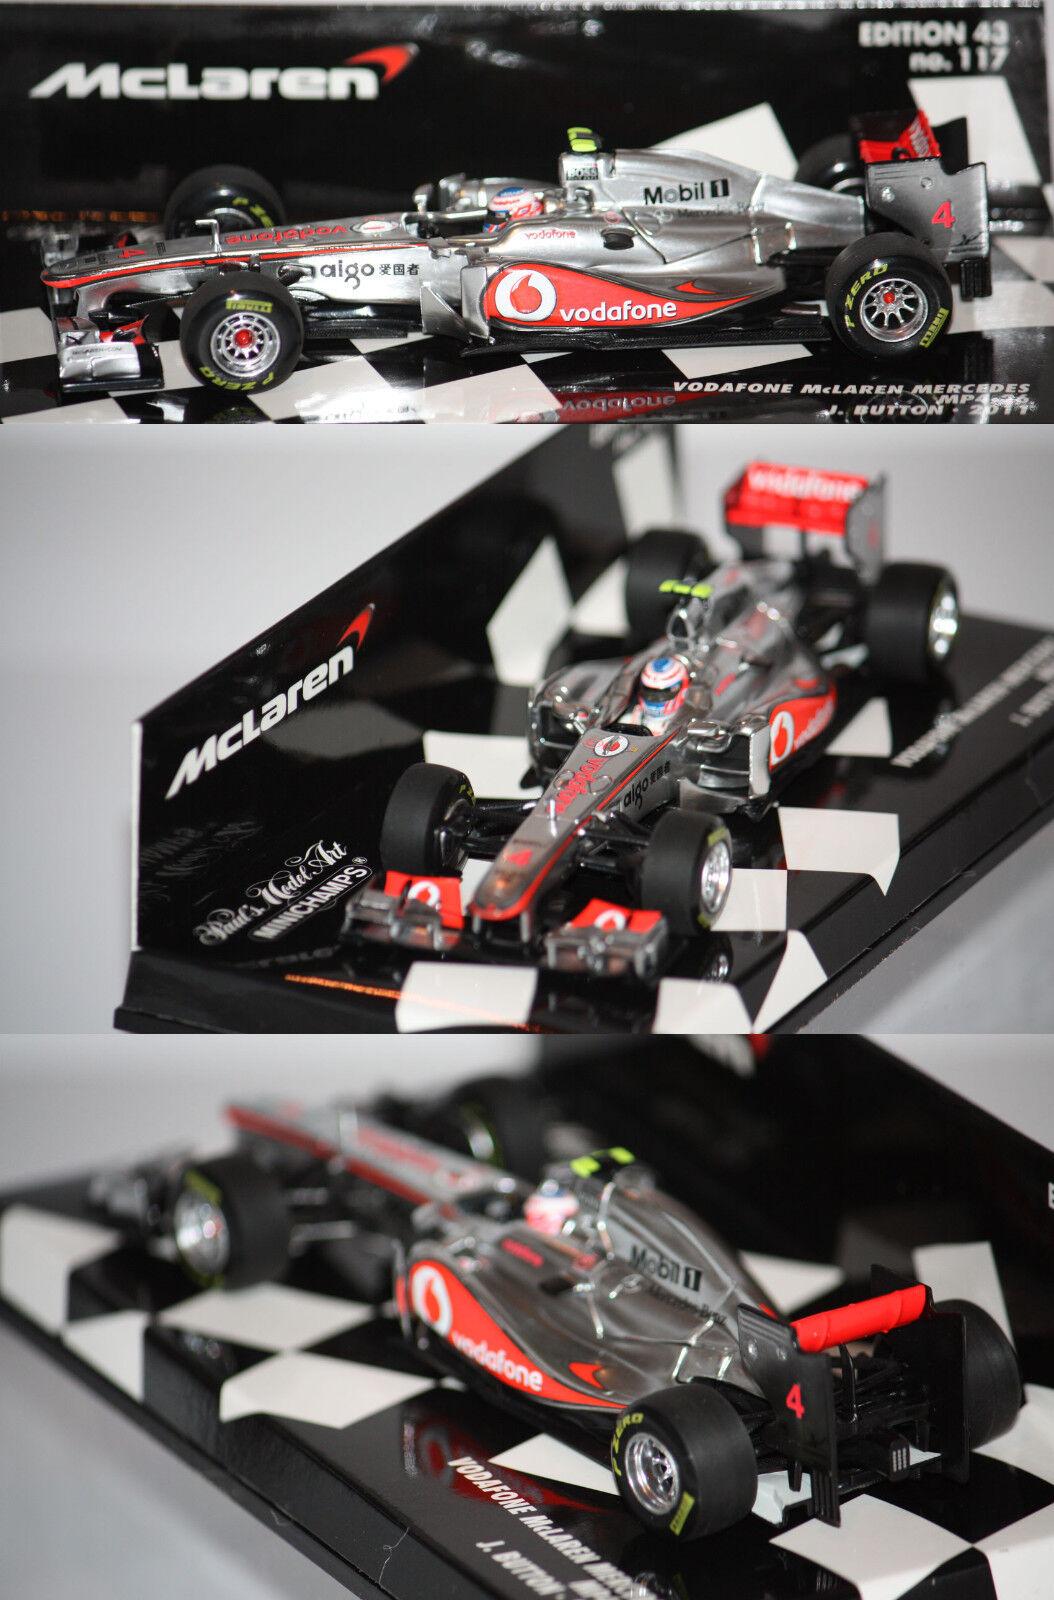 Minichamps F1 McLaren Mercedes MP4-26 J. Button 2011 1 43 530114304